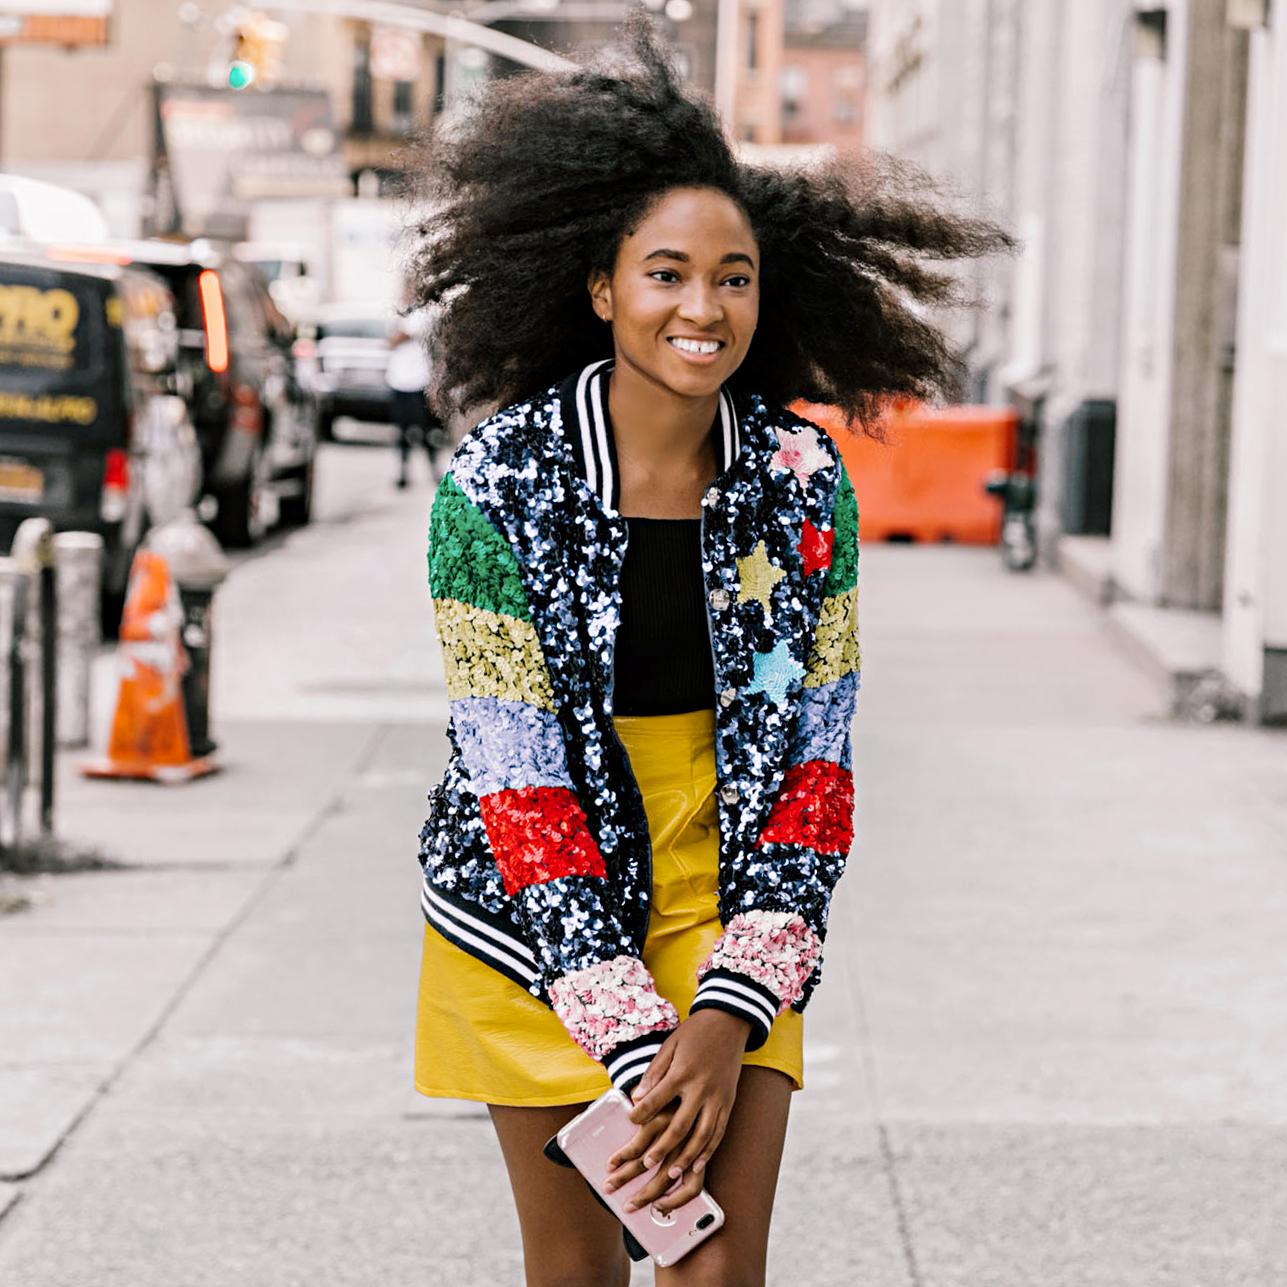 woman wearing bright hues promo